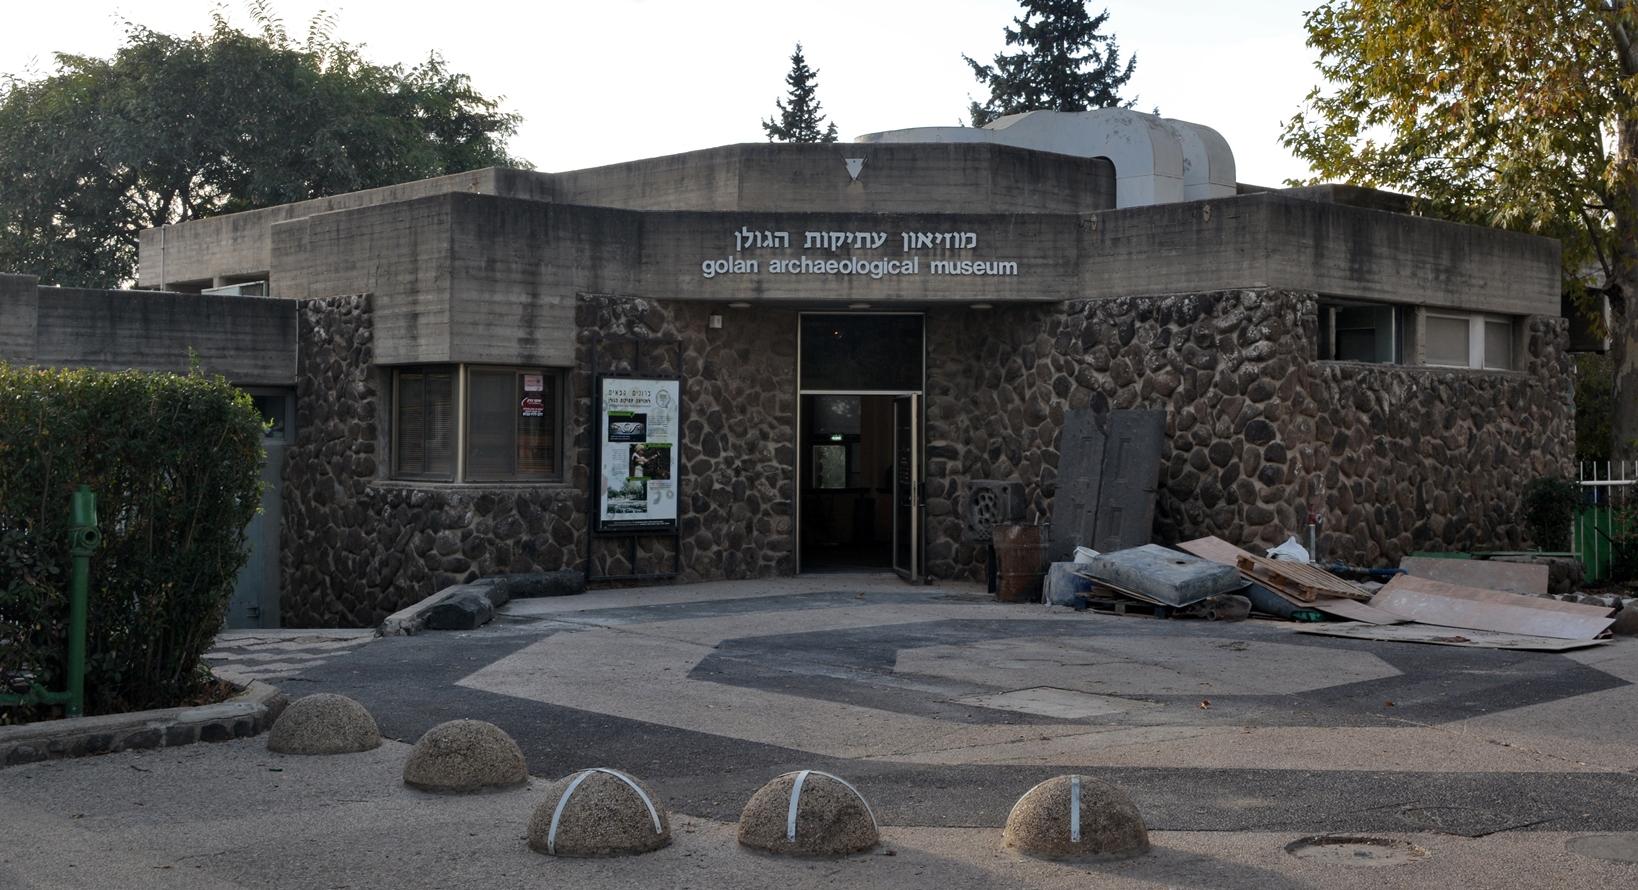 Golan Archeological Museum. Photo courtesy of Wikimedia Commons